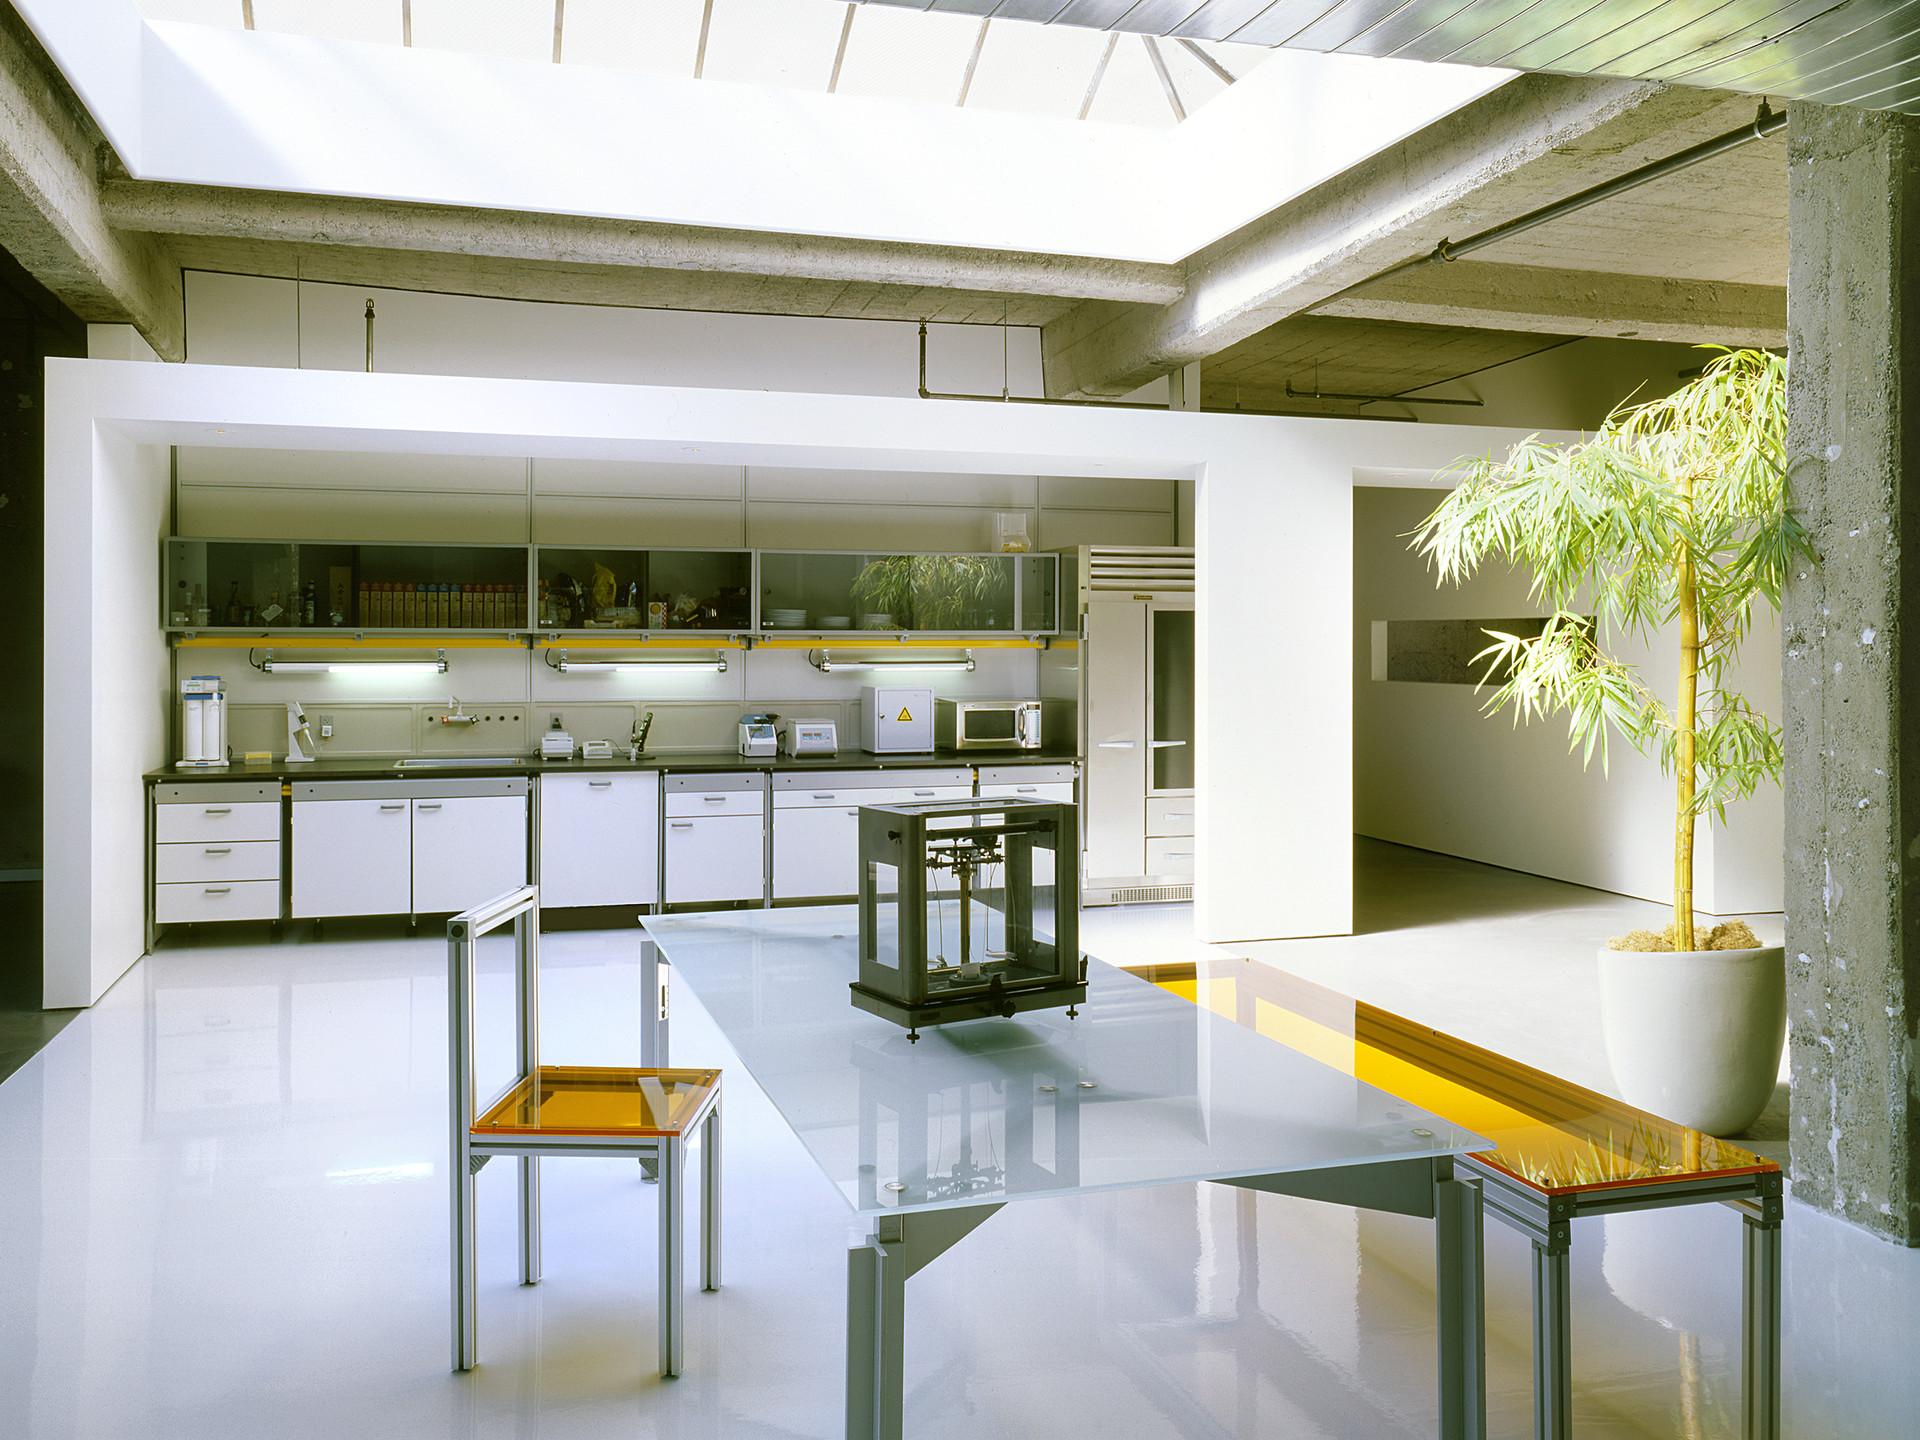 Folsom Street Residential Laboratory